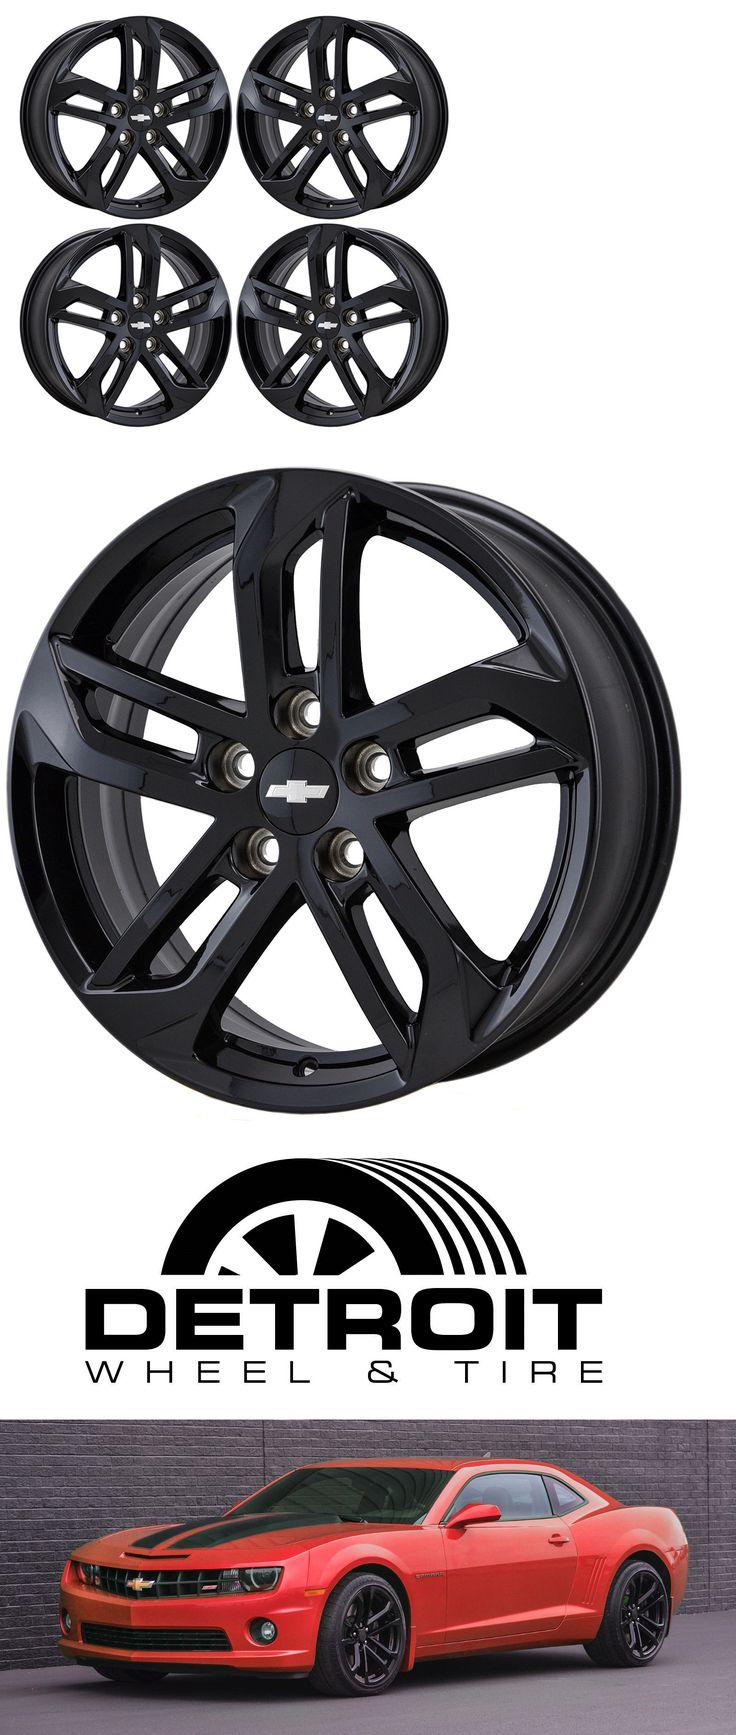 Auto parts general 18 chevrolet equinox black wheels rims factory oem set 4 2017